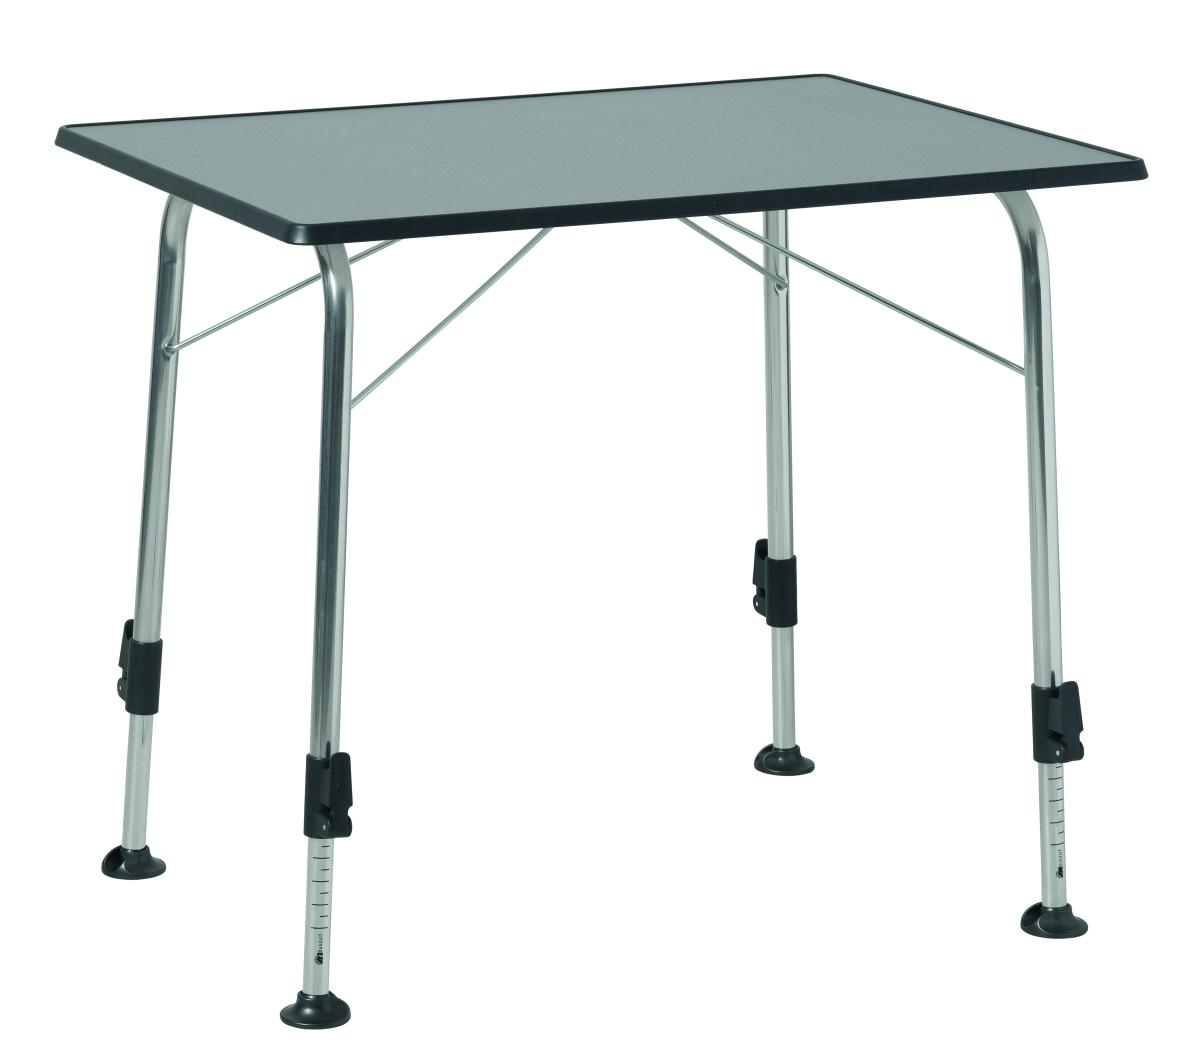 Dukdalf Tisch STABILIC I Luxe